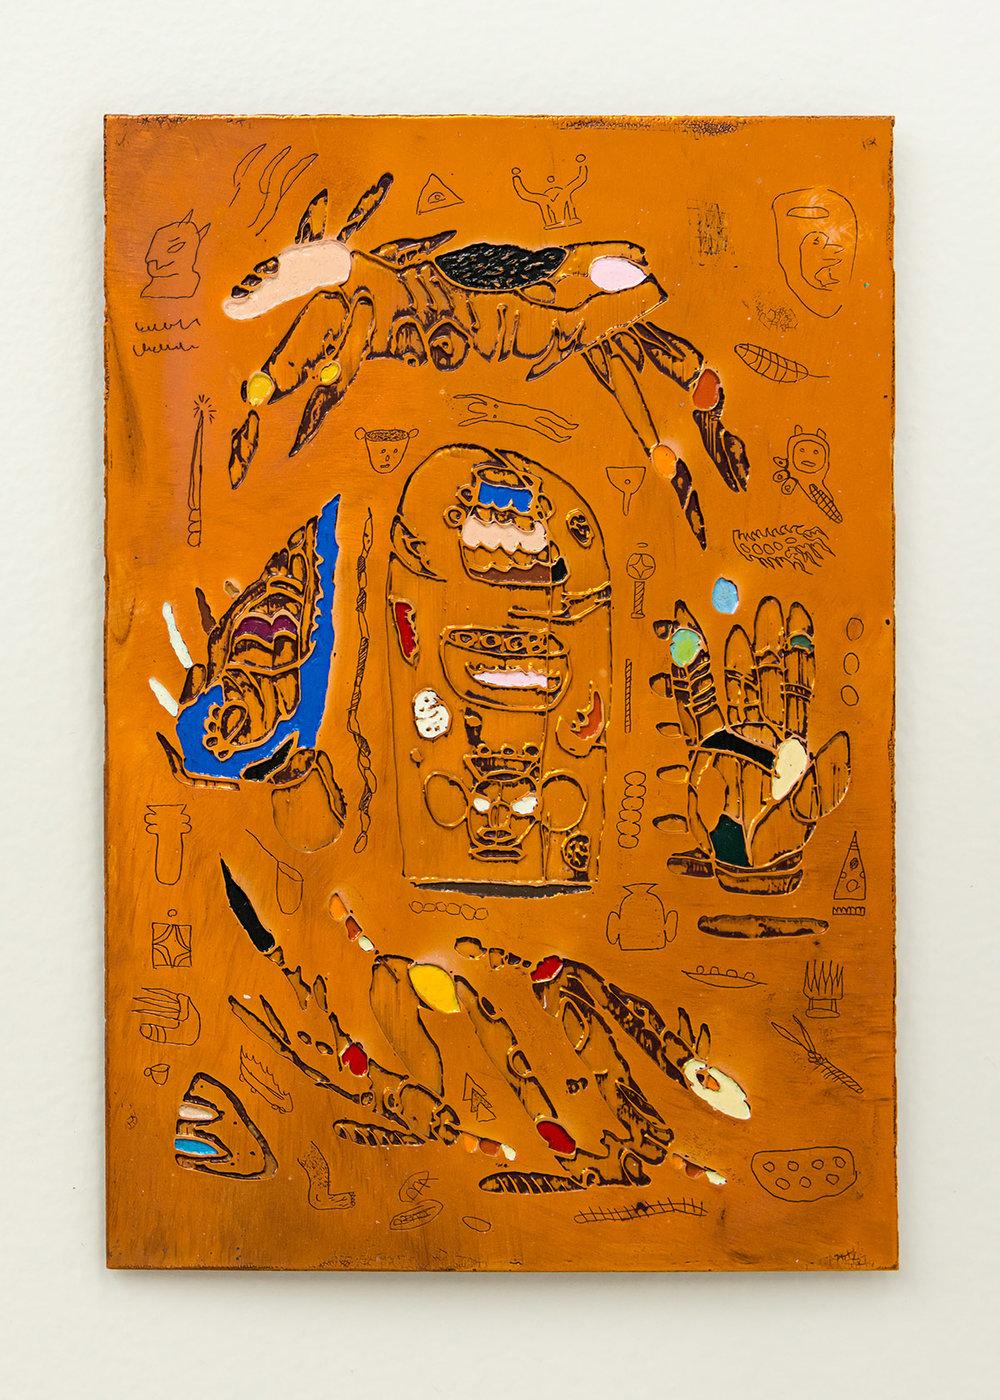 Matias Armendaris, 'Scroll Mirror III', Sculpture, tarnished copper and enamel paint, 6 x 9 in, 2017